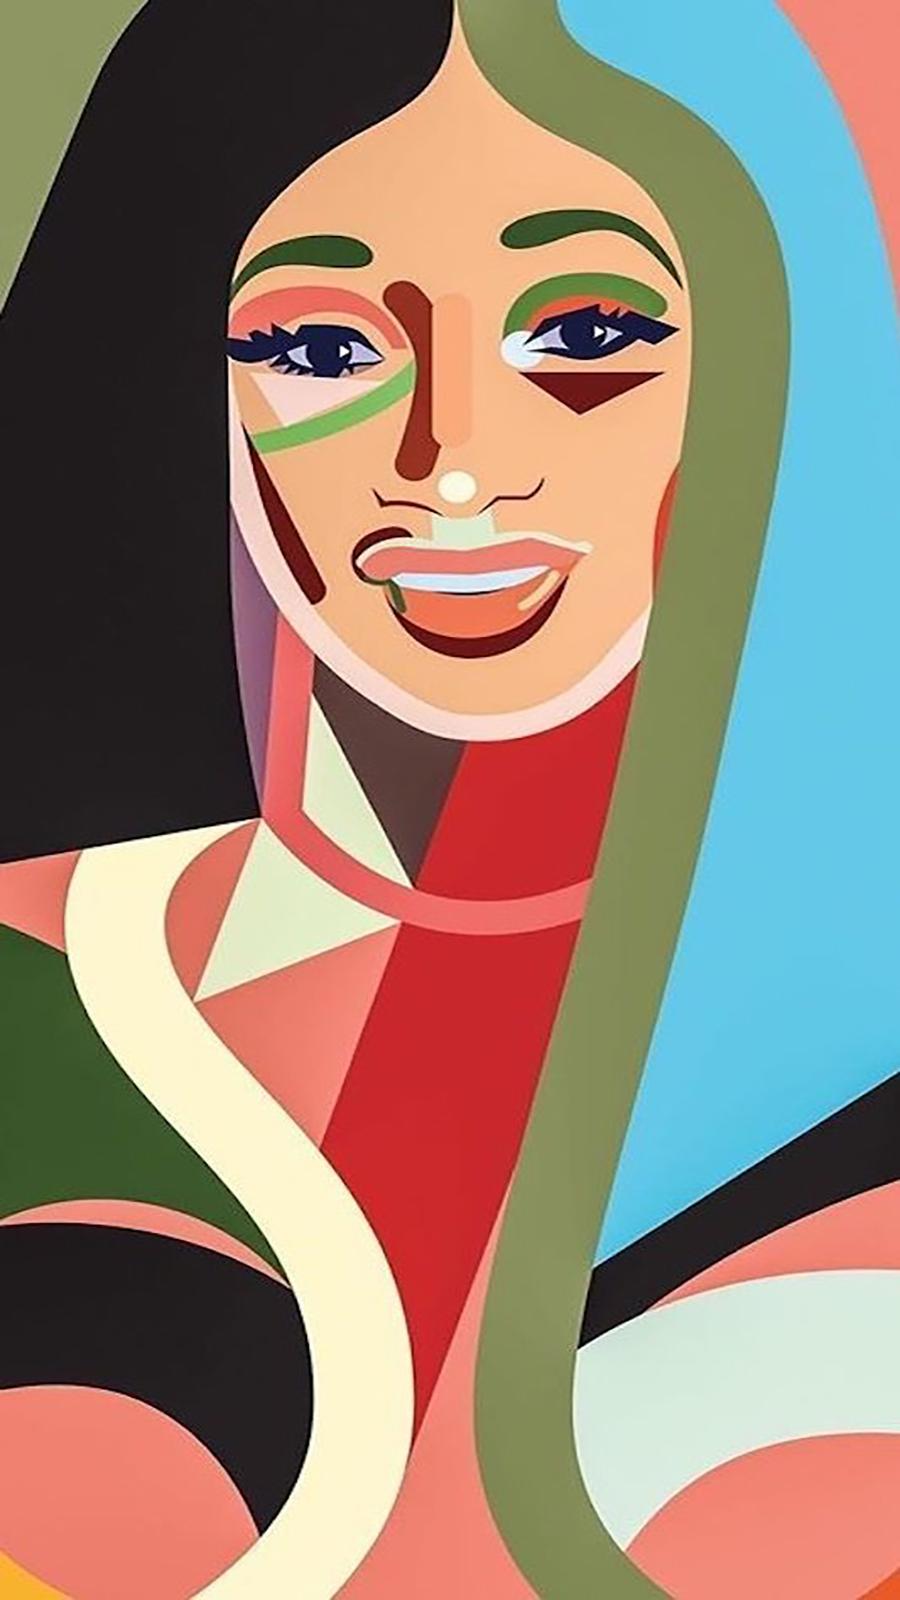 Art Cardi B Background Wallpapers Free Download